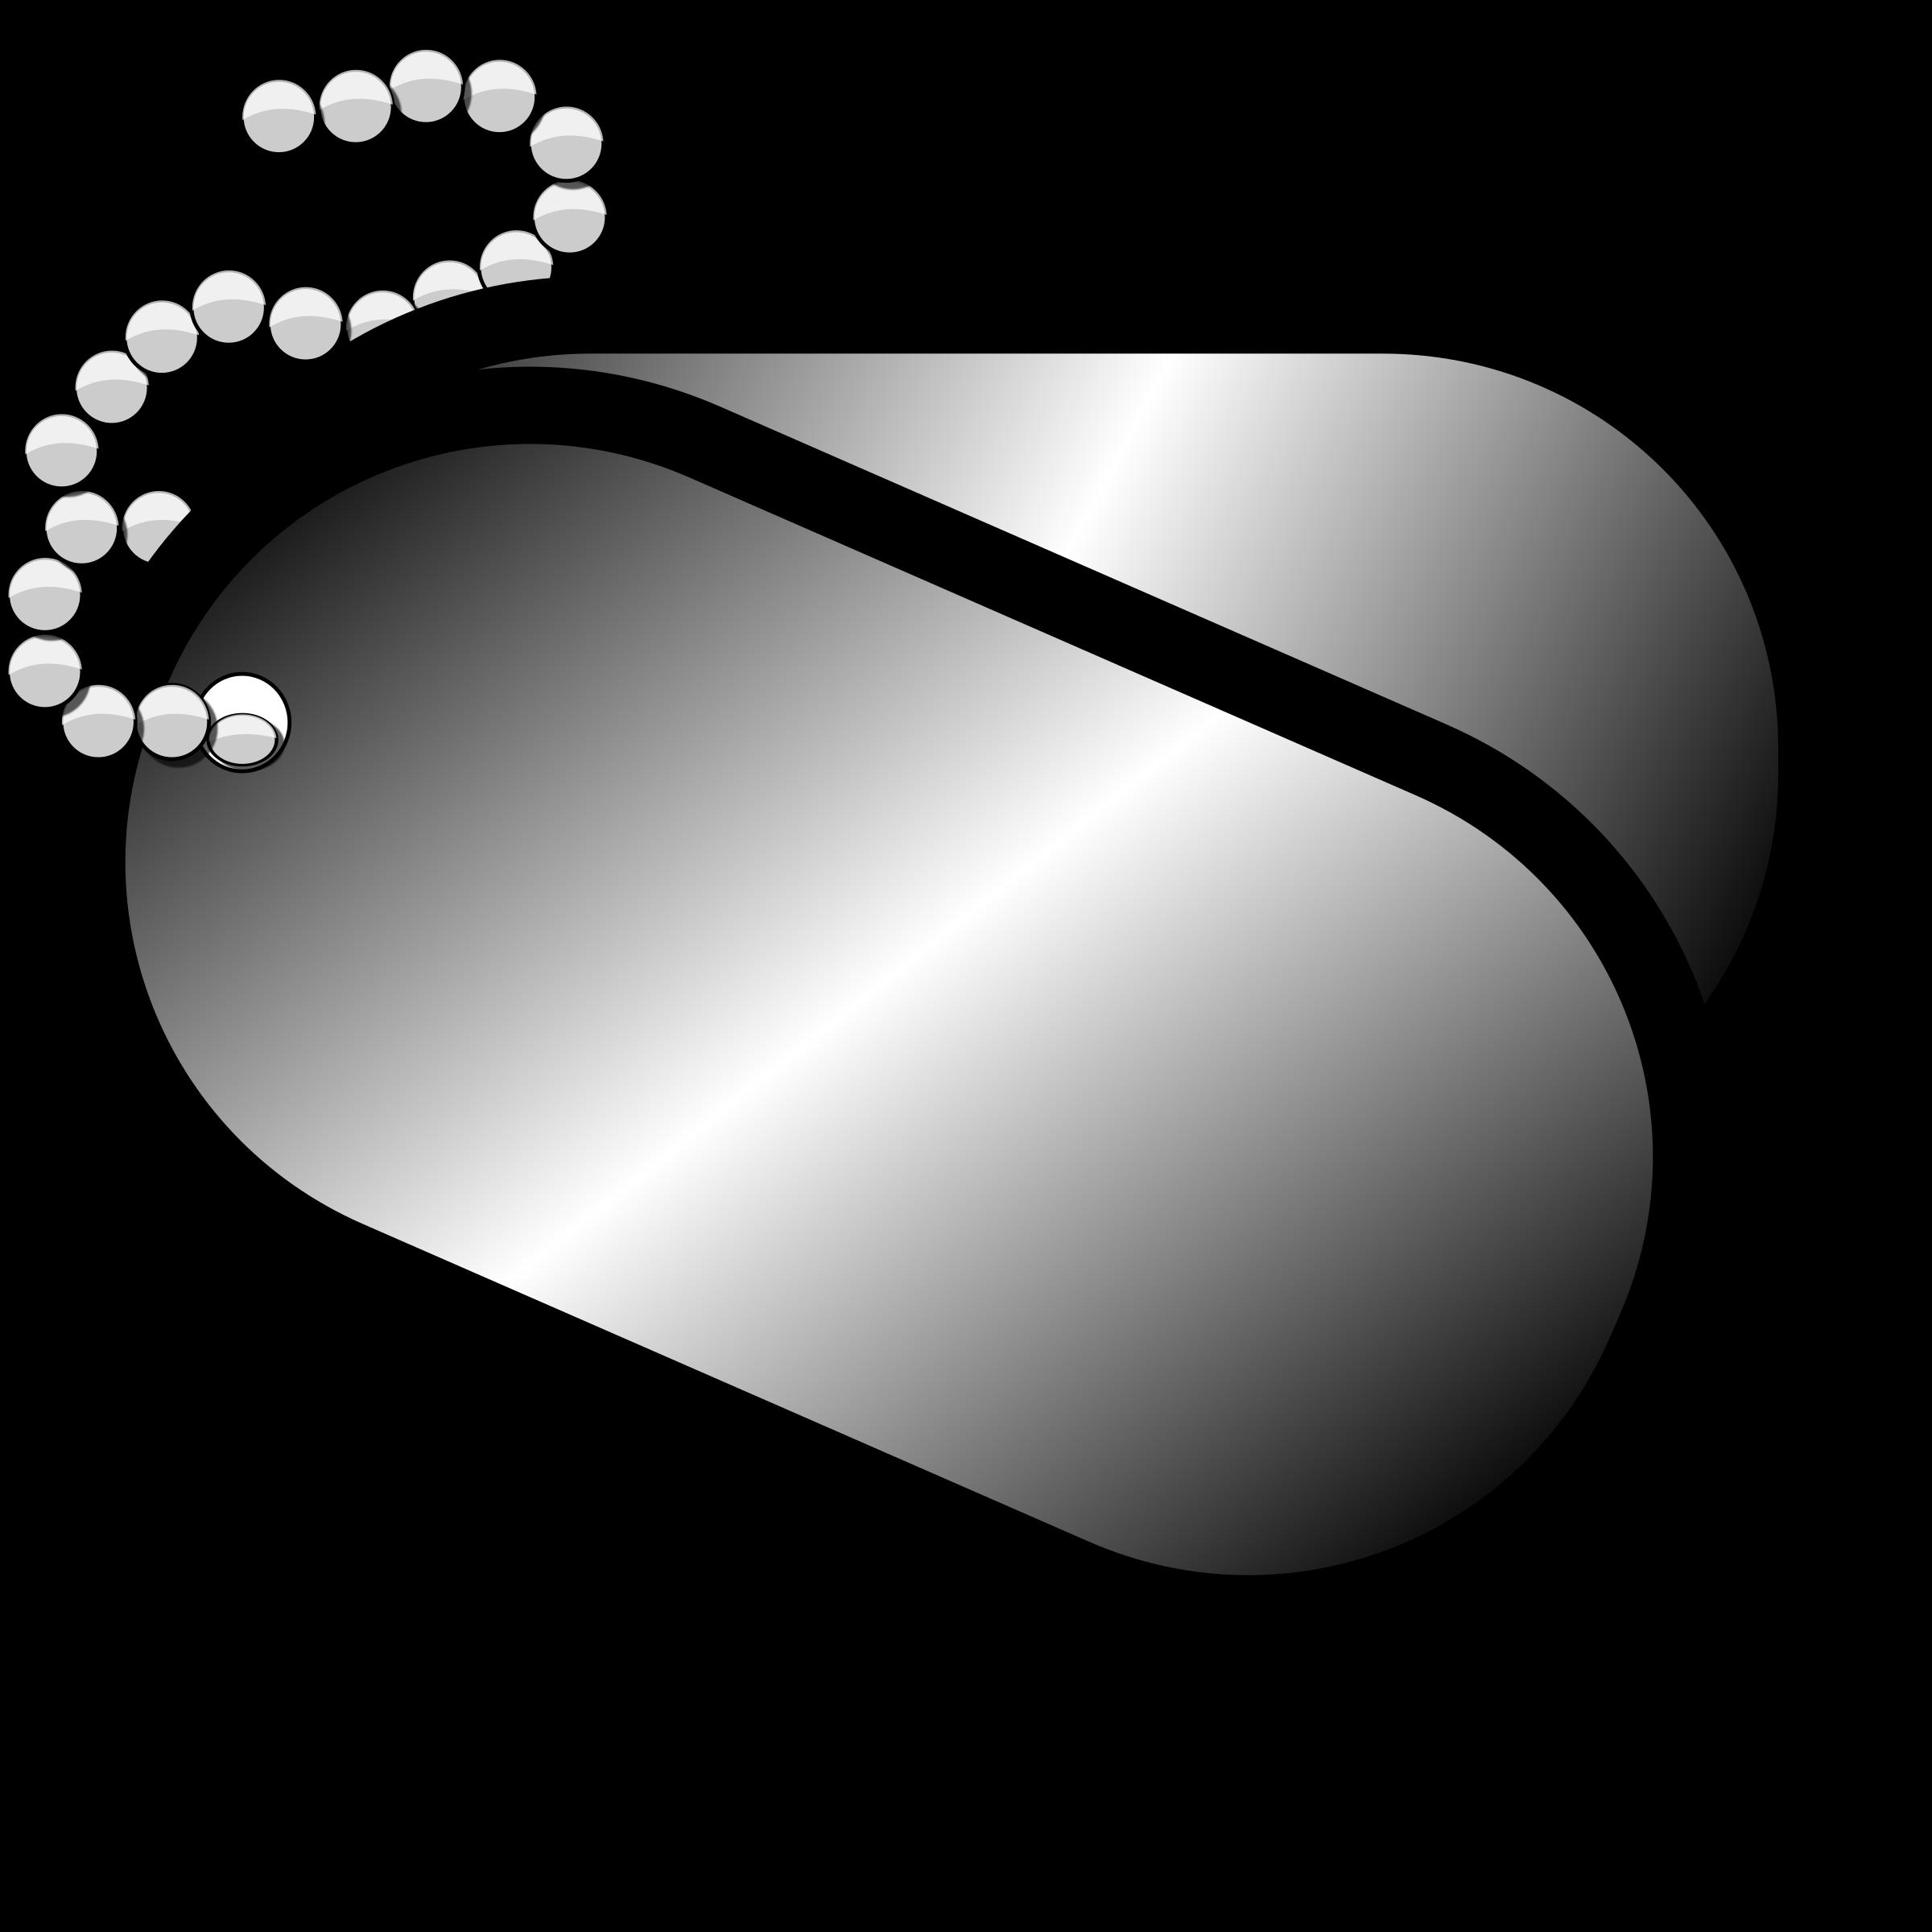 clip transparent library Clipart